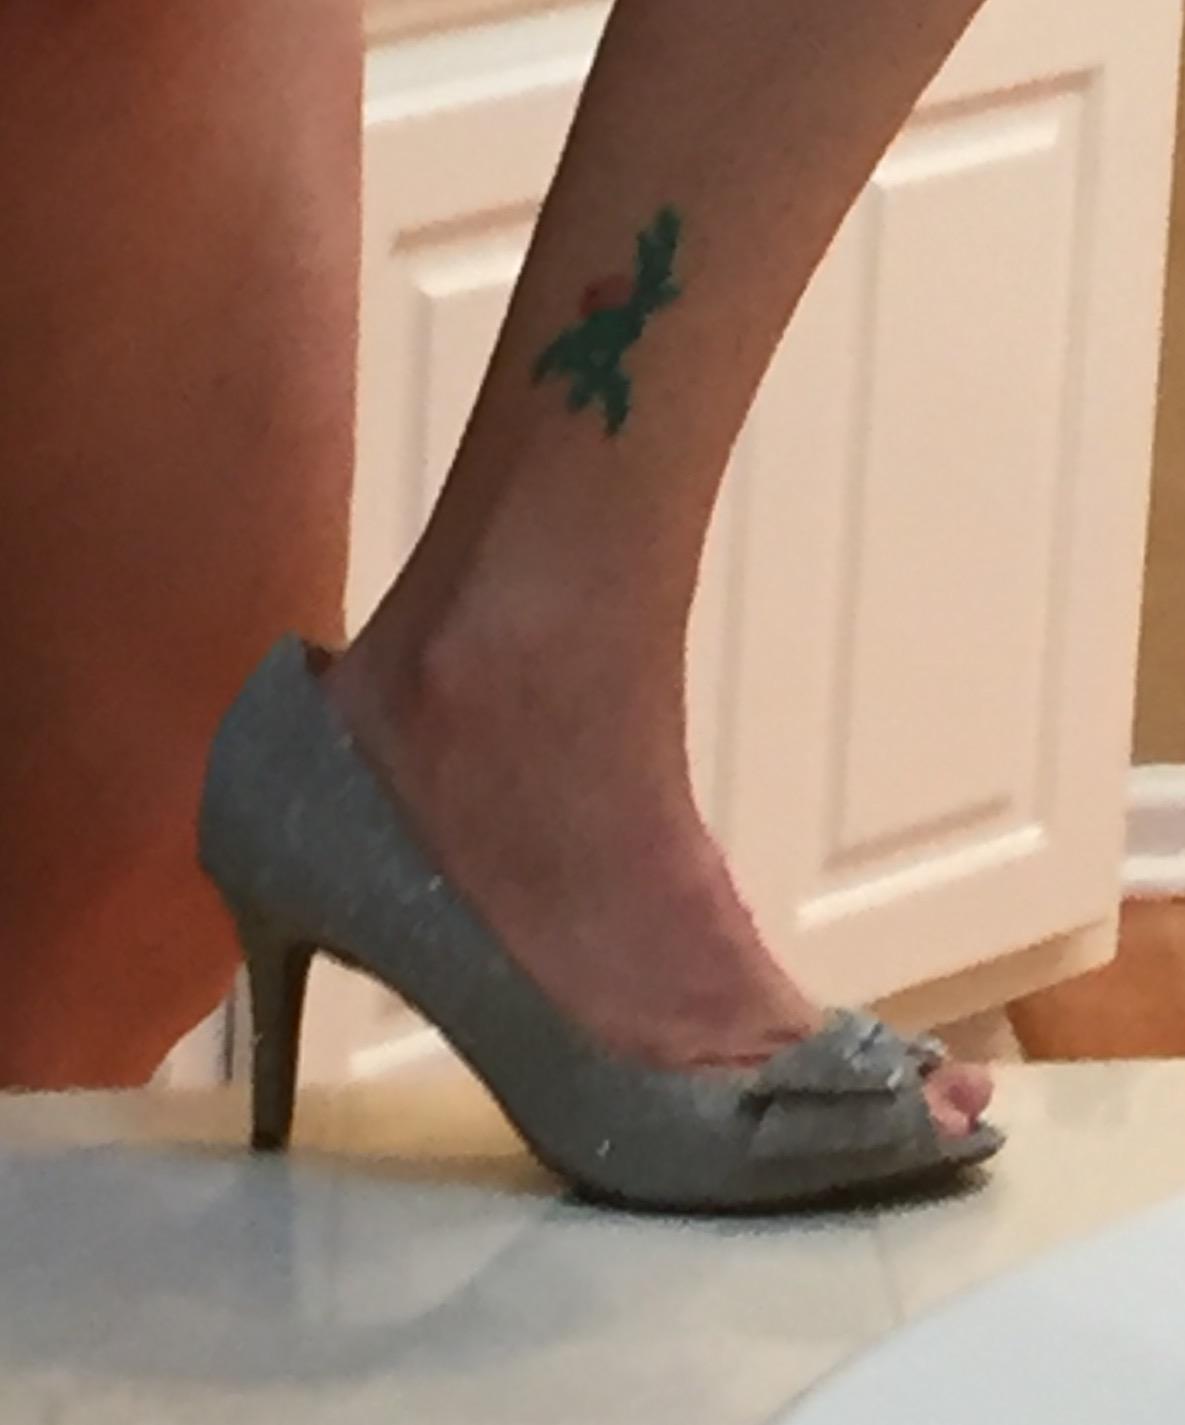 Scottish Small Flower Tattoo On Leg